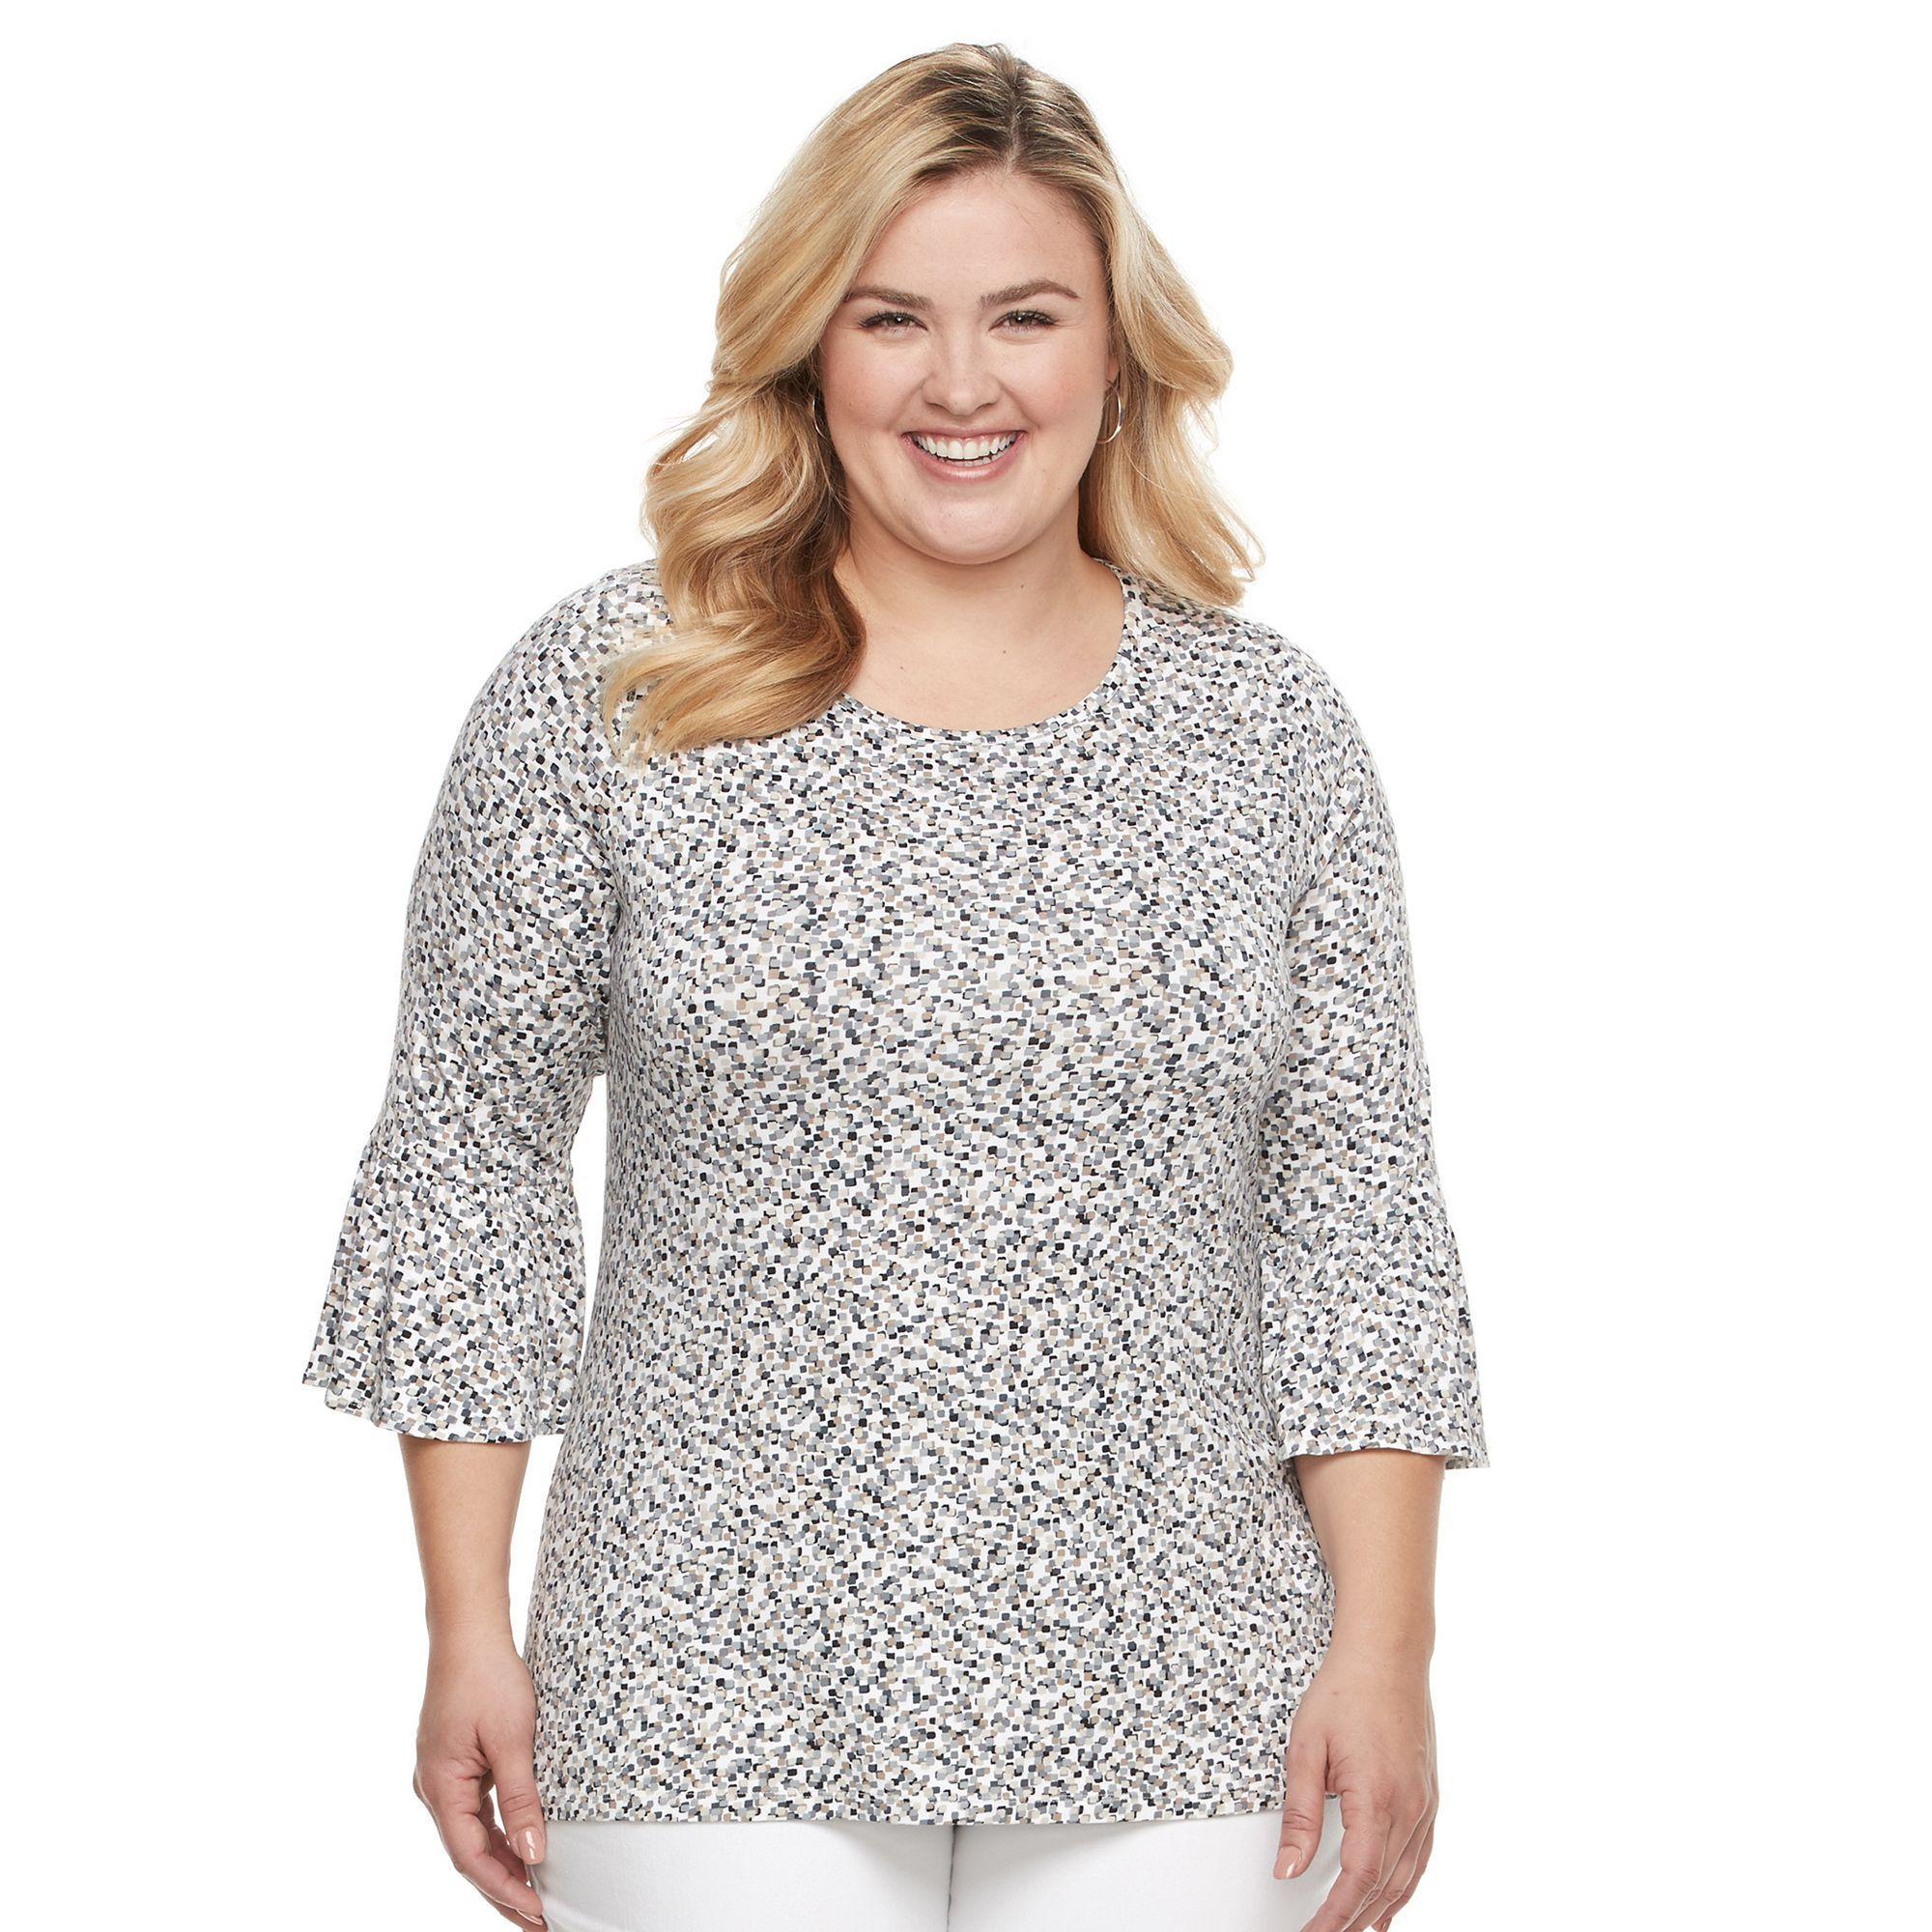 Plus Size Croft & Barrow® Bell Sleeve Peasant Top, Women's, Size: 3XL, Med Beige